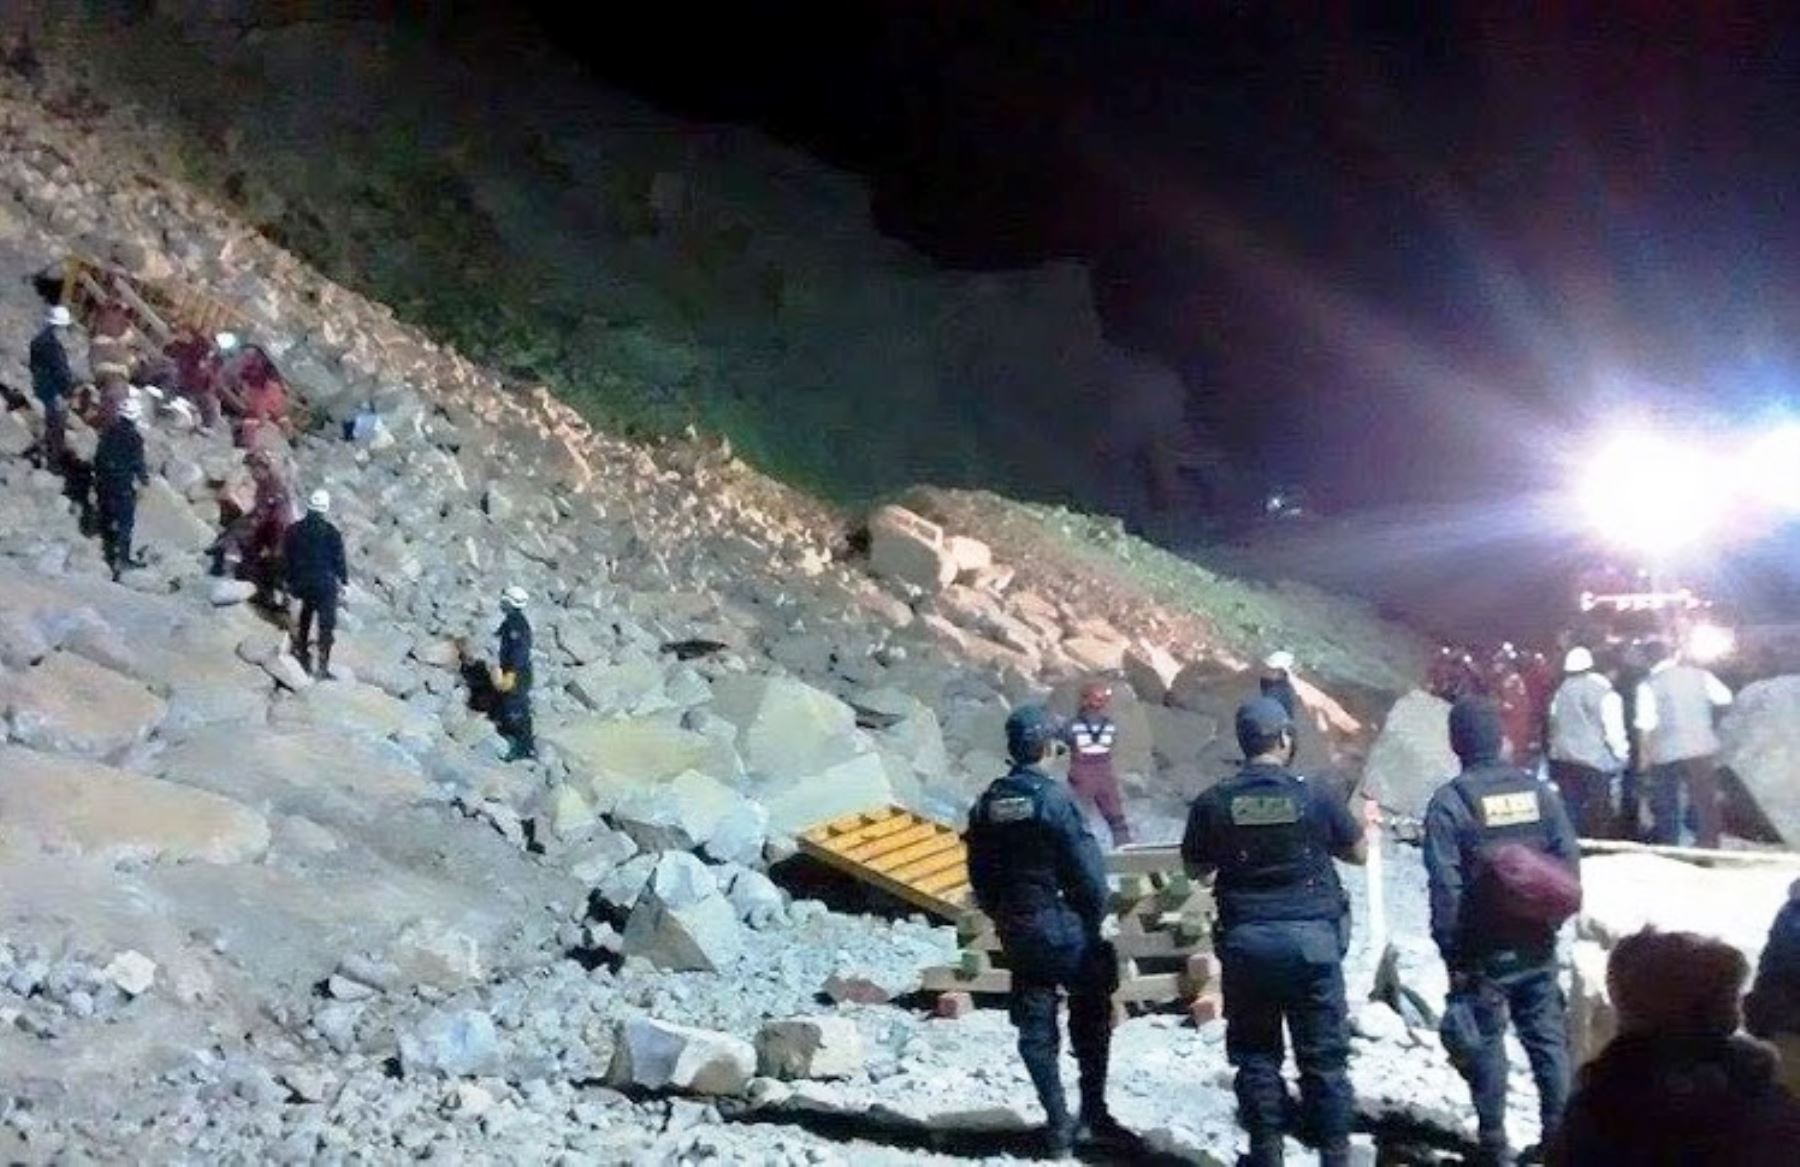 Indeci confirma que el derrumbe que sepultó a una miniván dejó 6 muertos. Foto: Huachoenlínea.